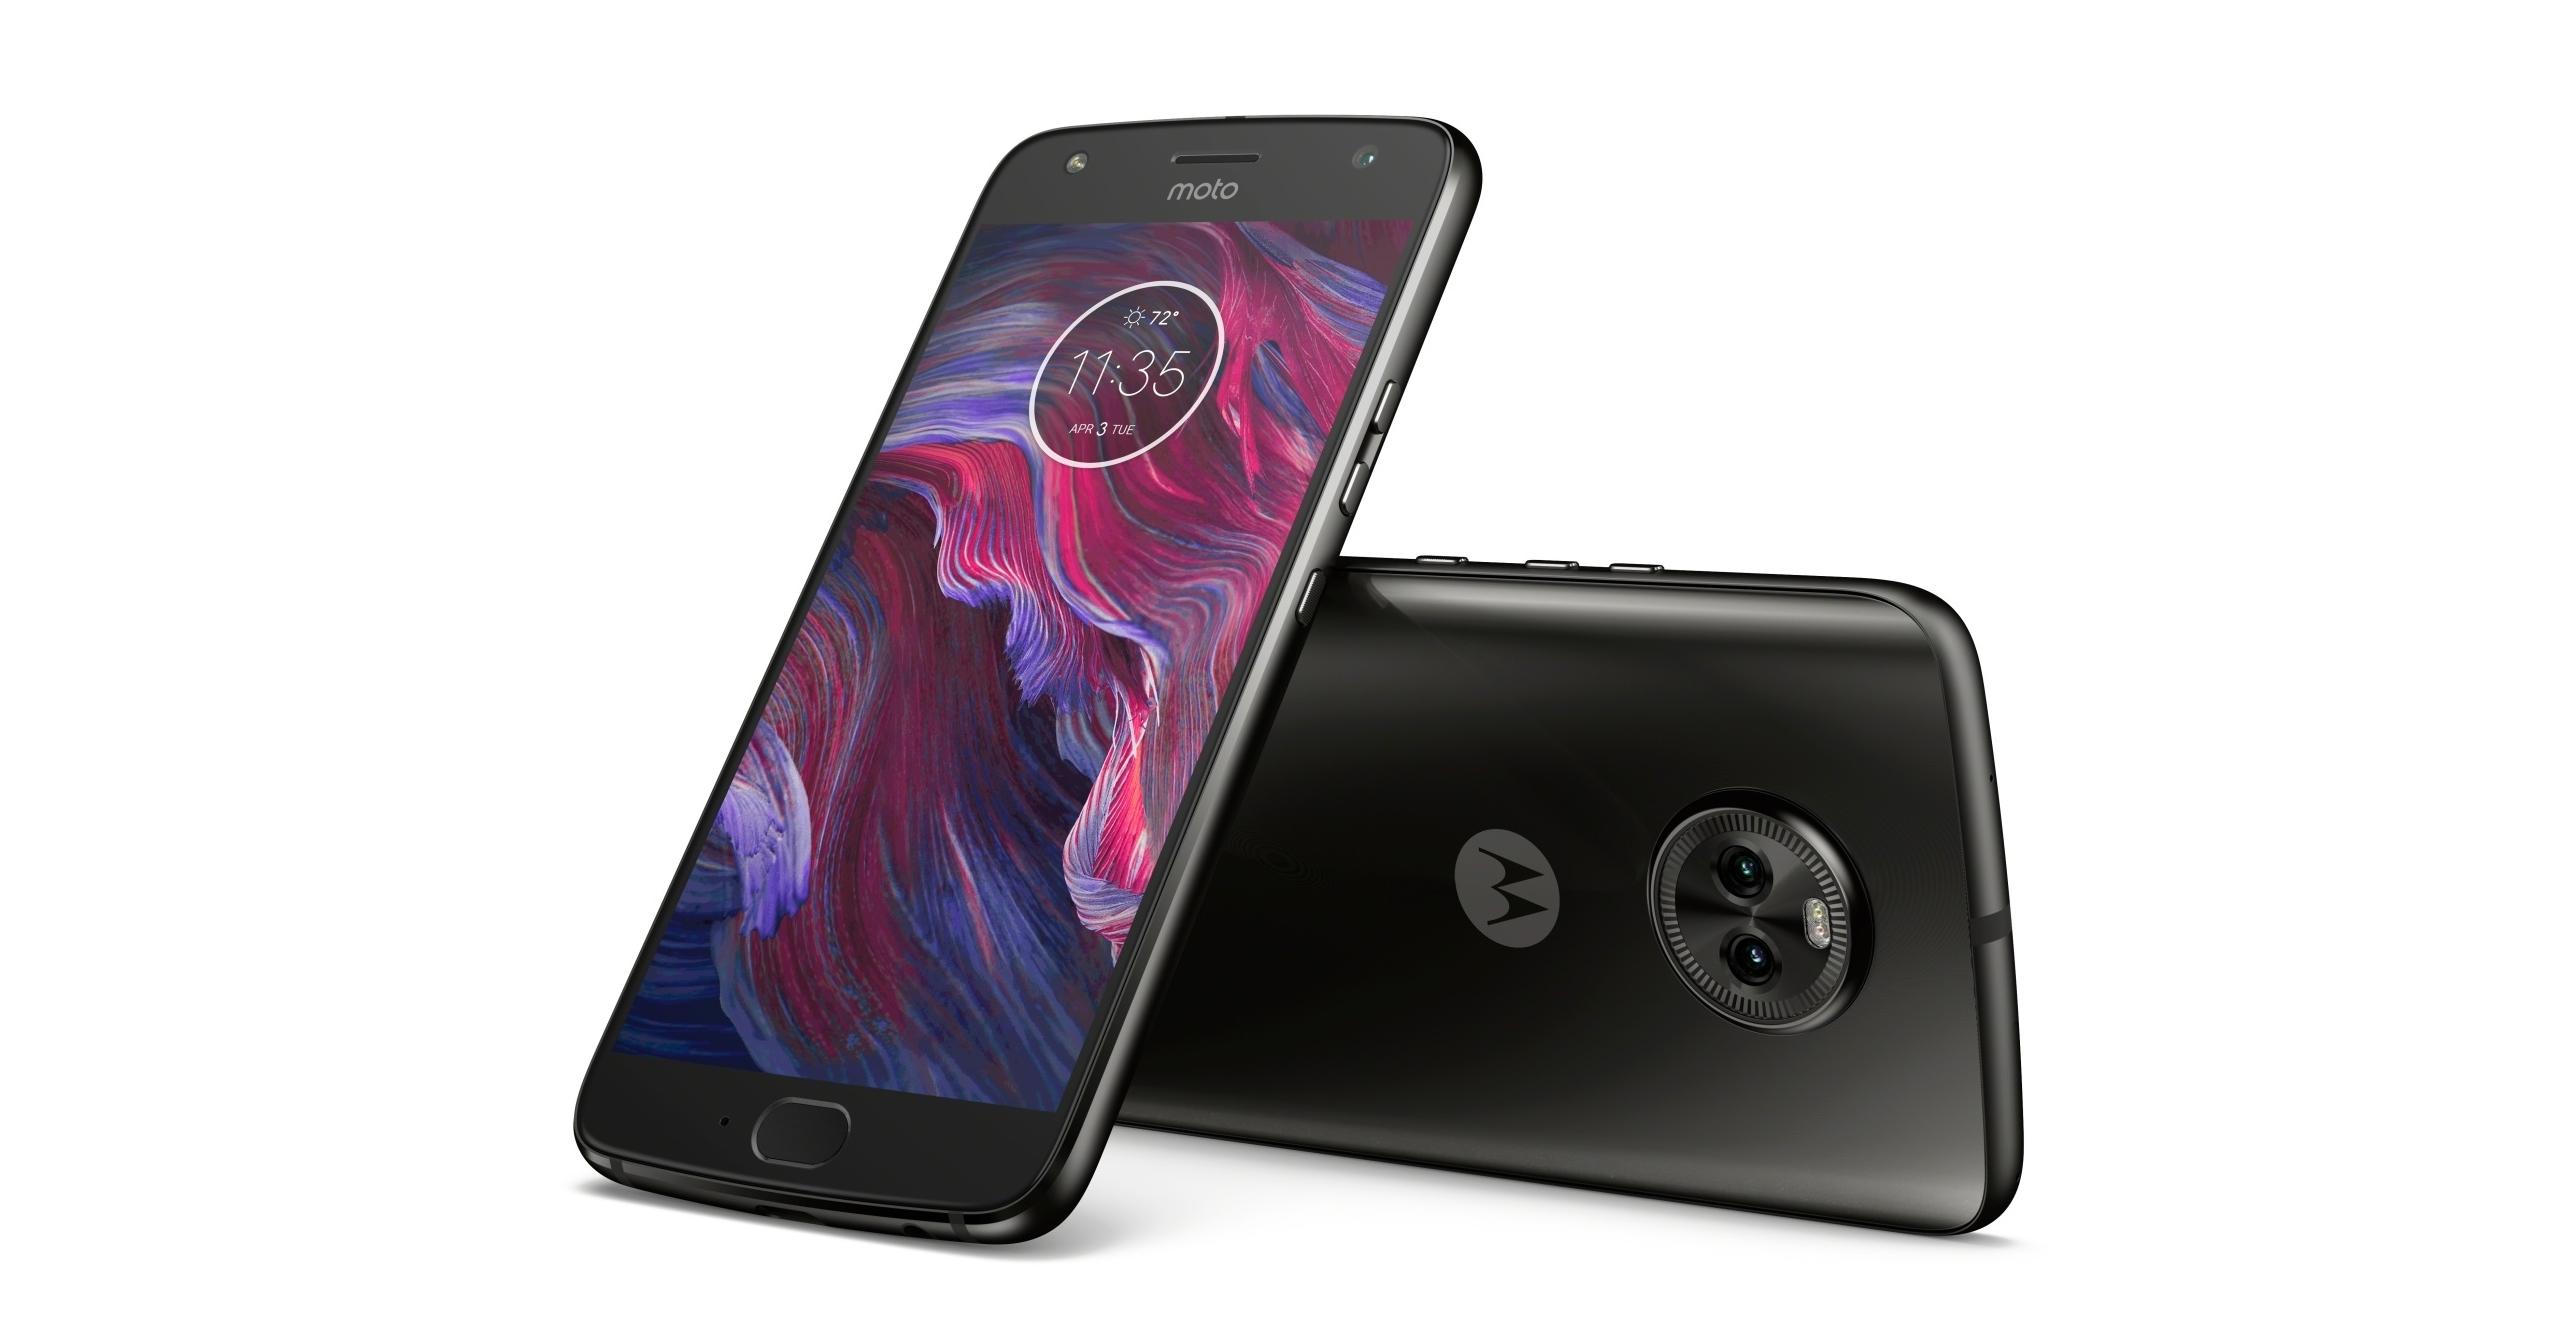 Motorola 雙鏡頭中階新機 moto x4 明日開賣,首購價 11,500 元